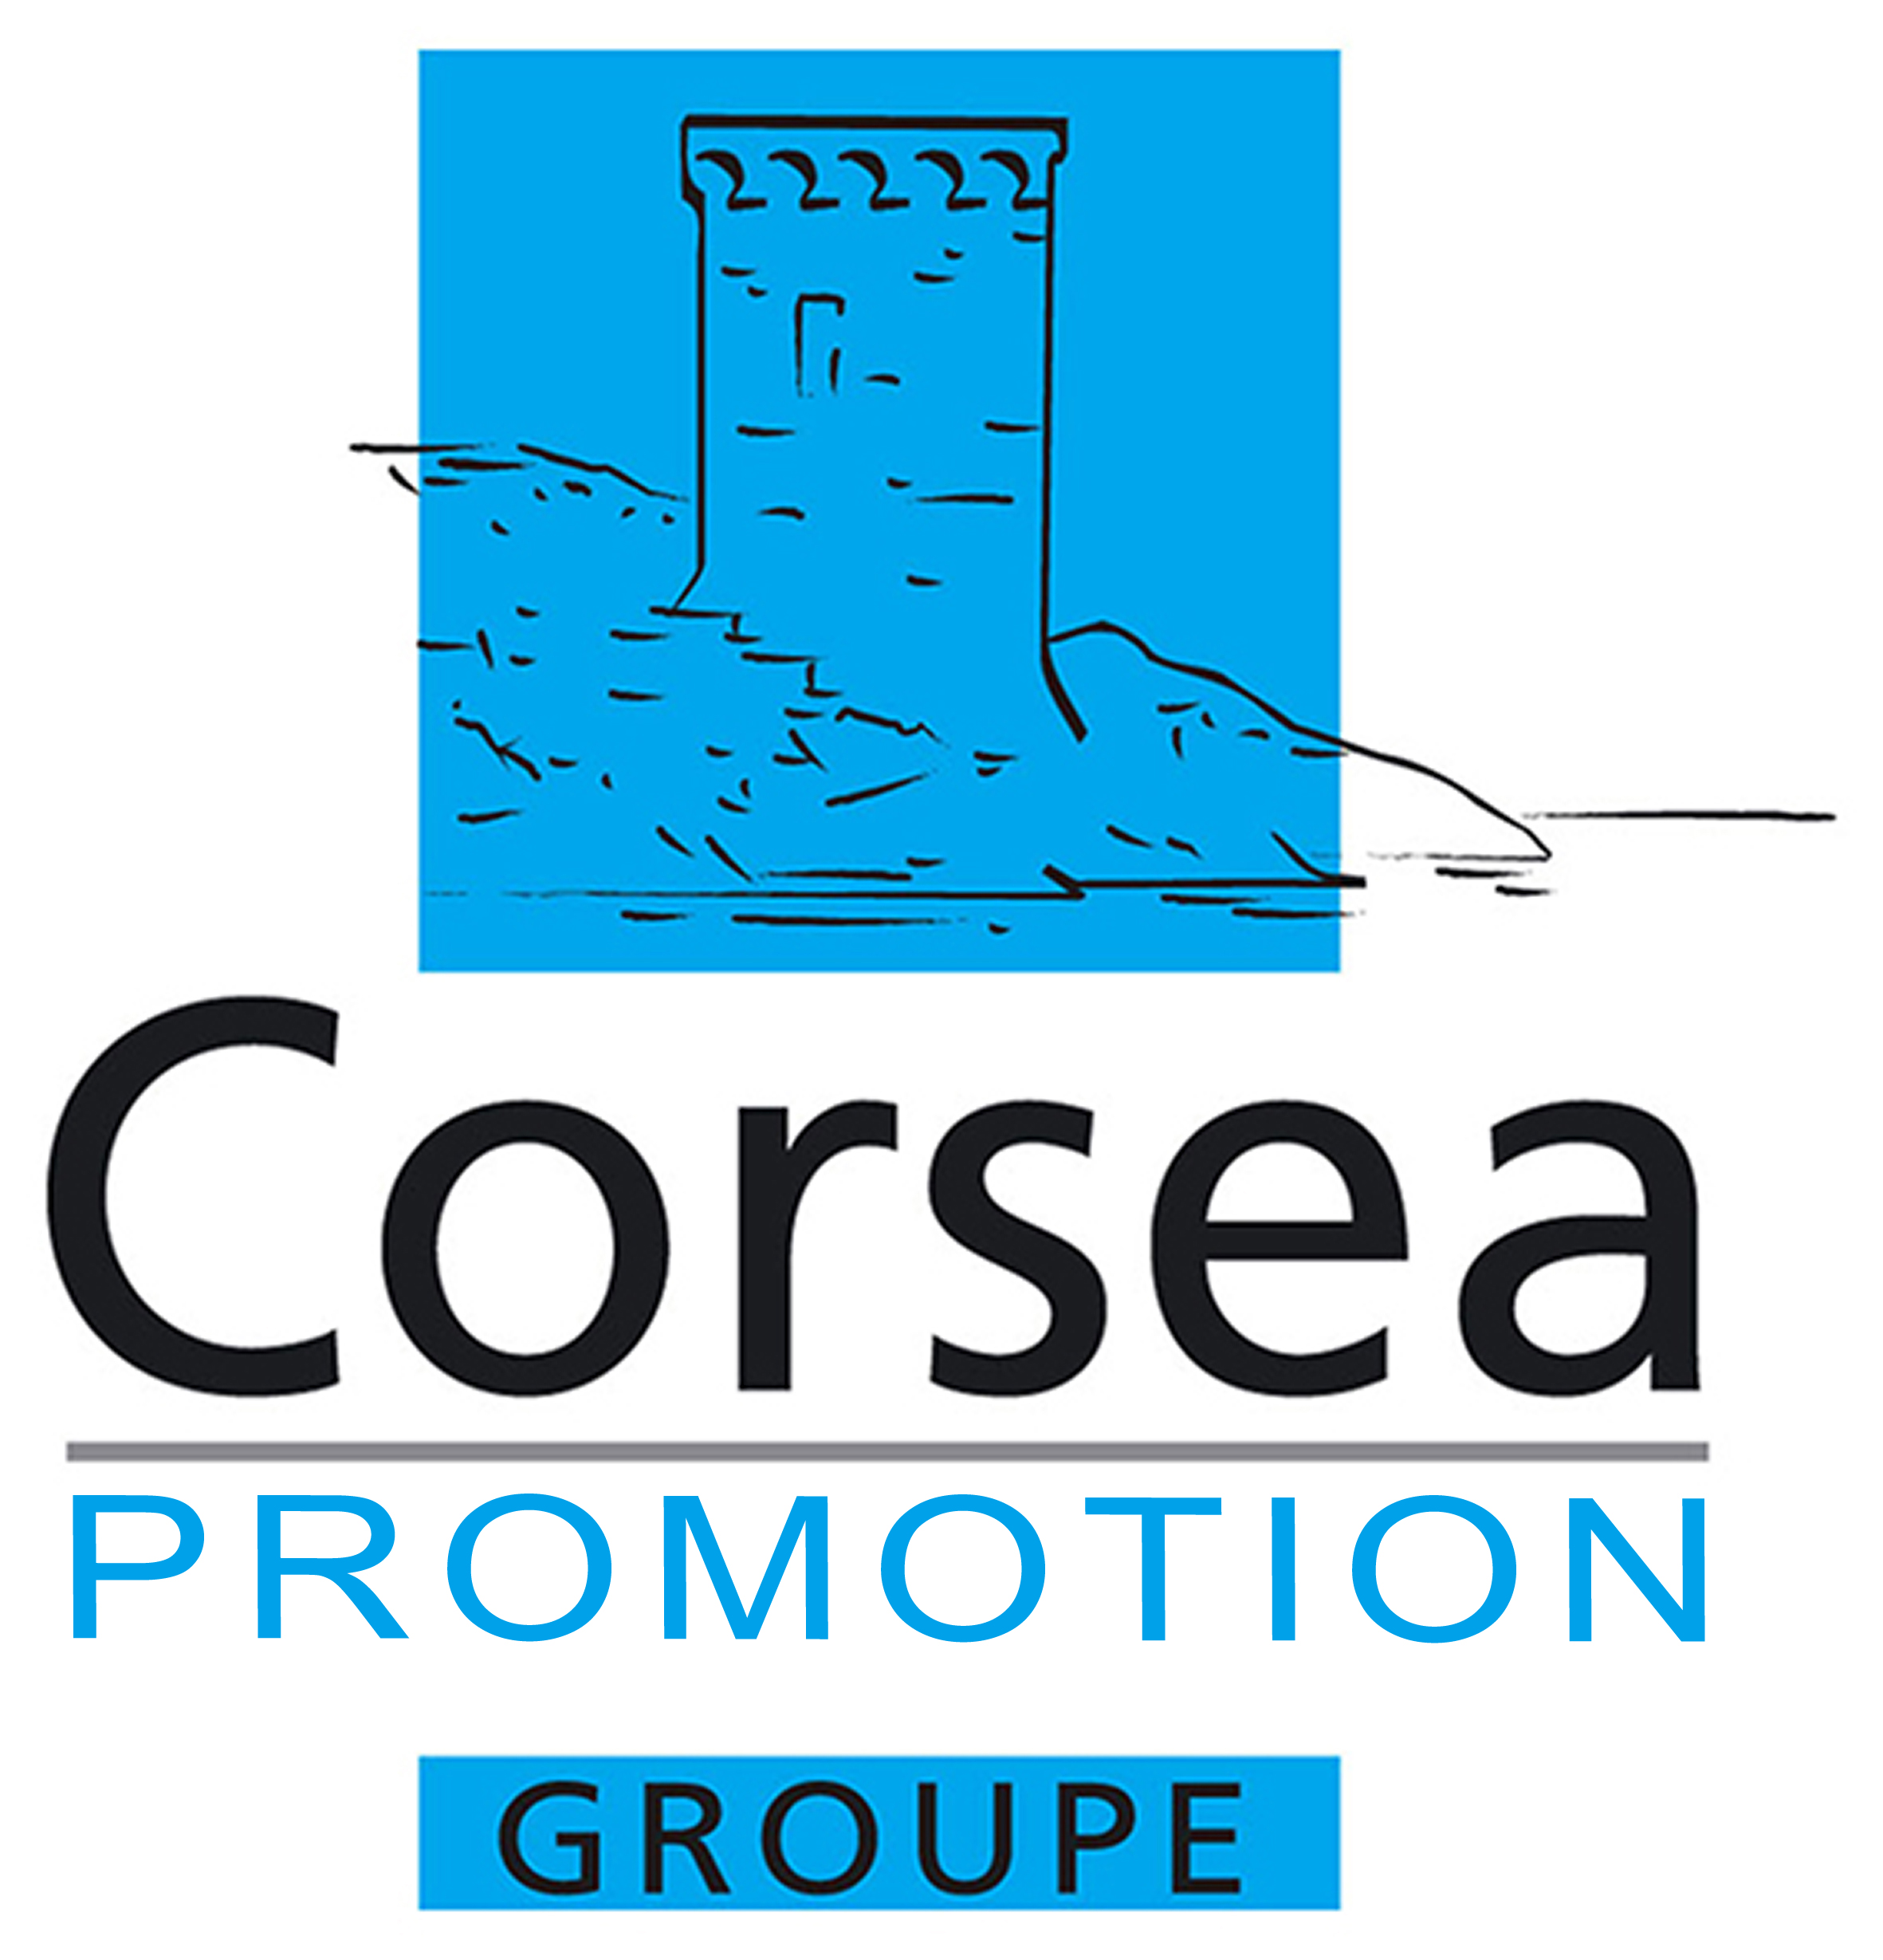 CORSEA PROMOTION a financé 3 projets grâce au crowdfunding